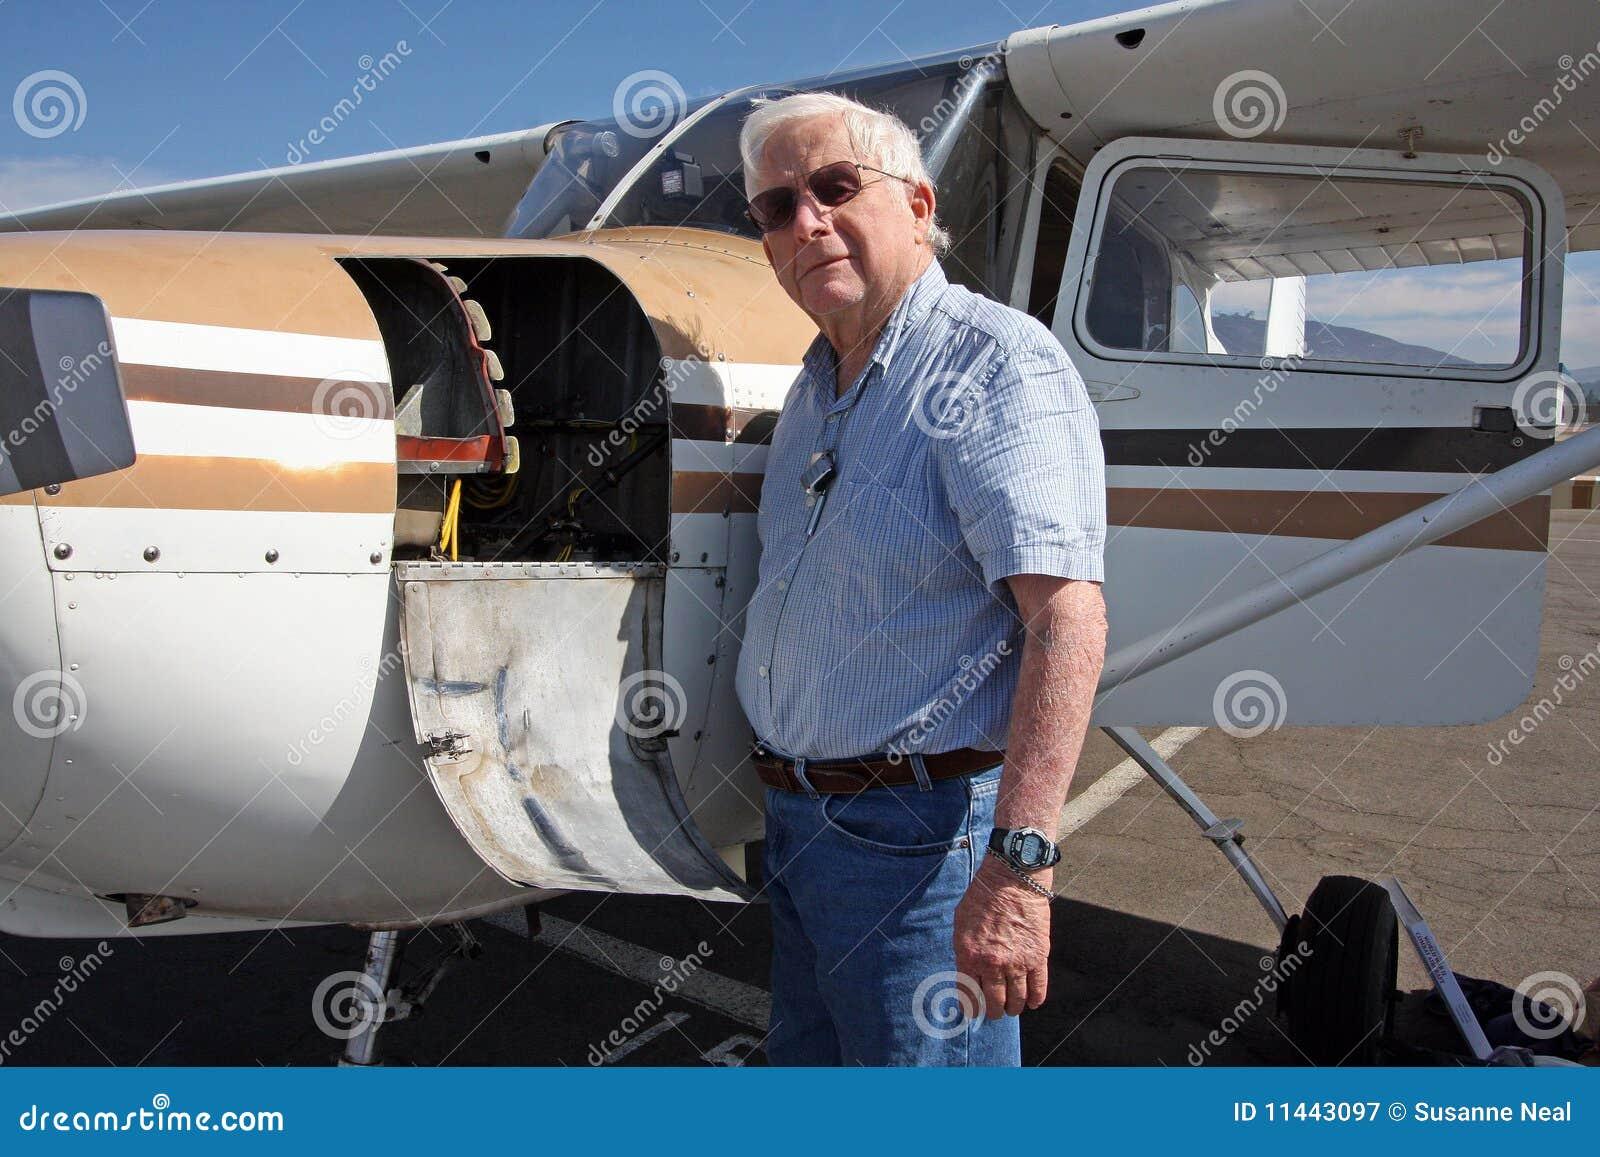 Male senior and private airplane